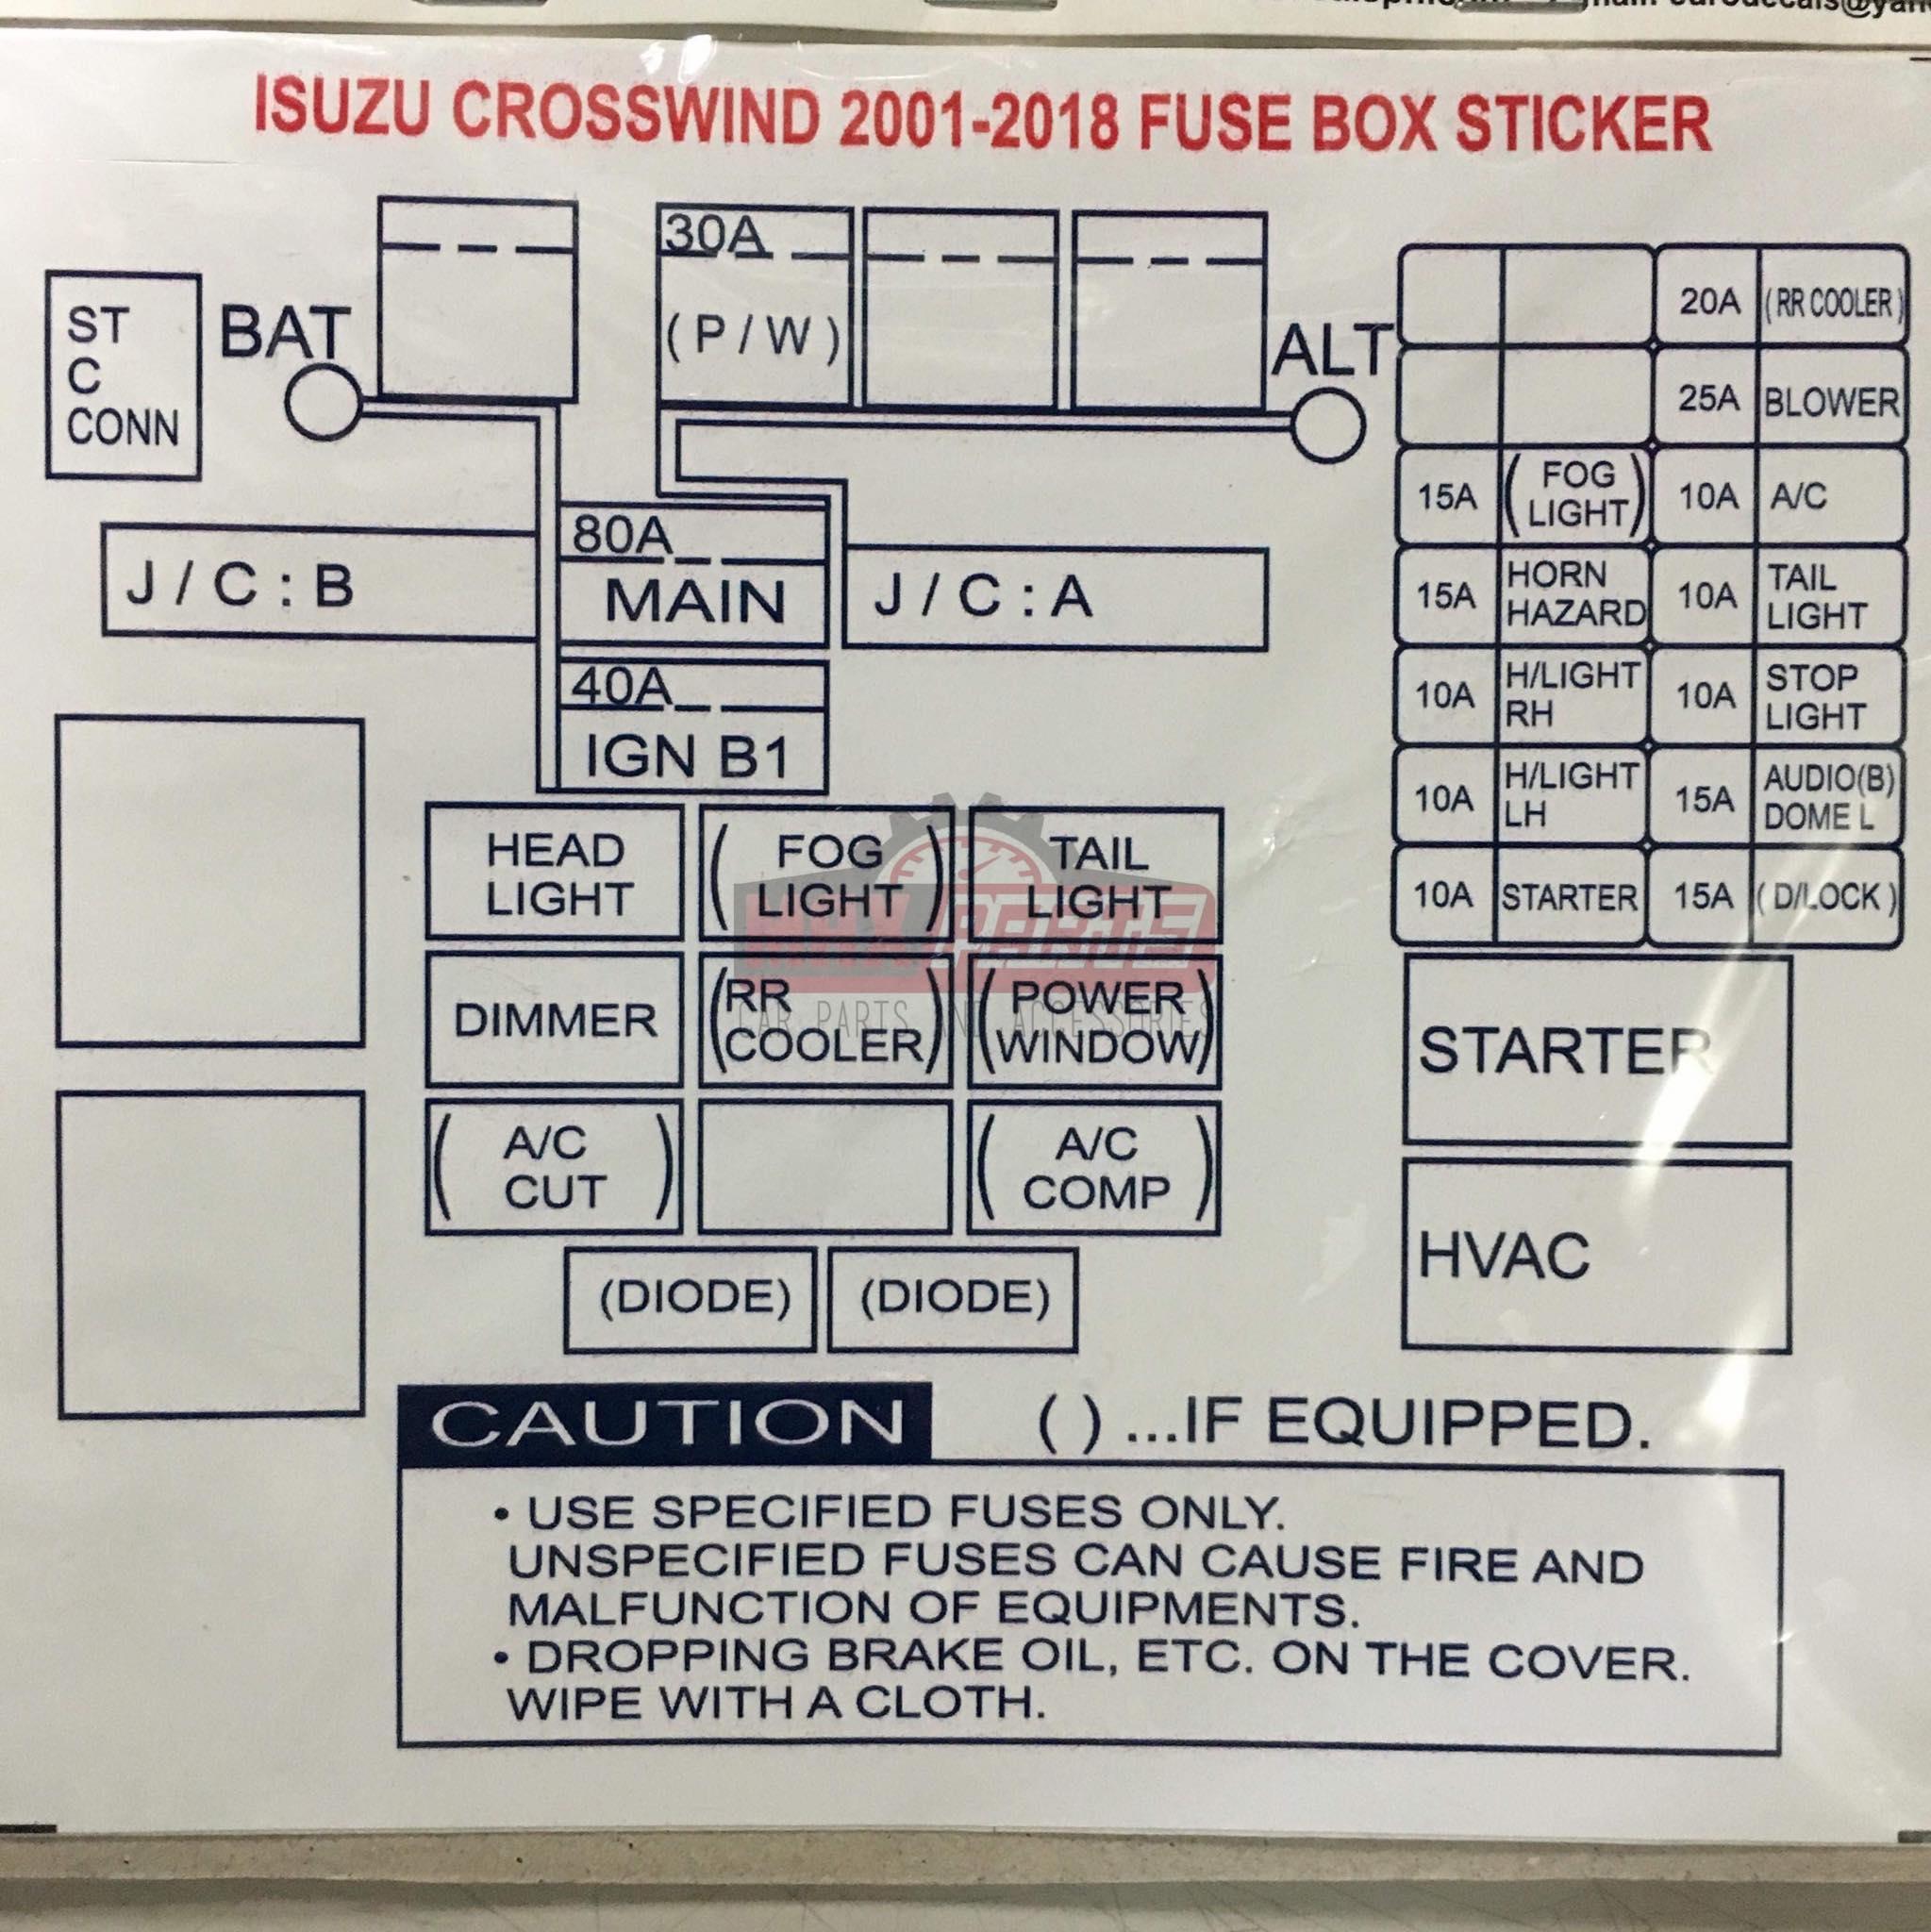 isuzu crosswind fusebox decals | lazada ph  lazada philippines